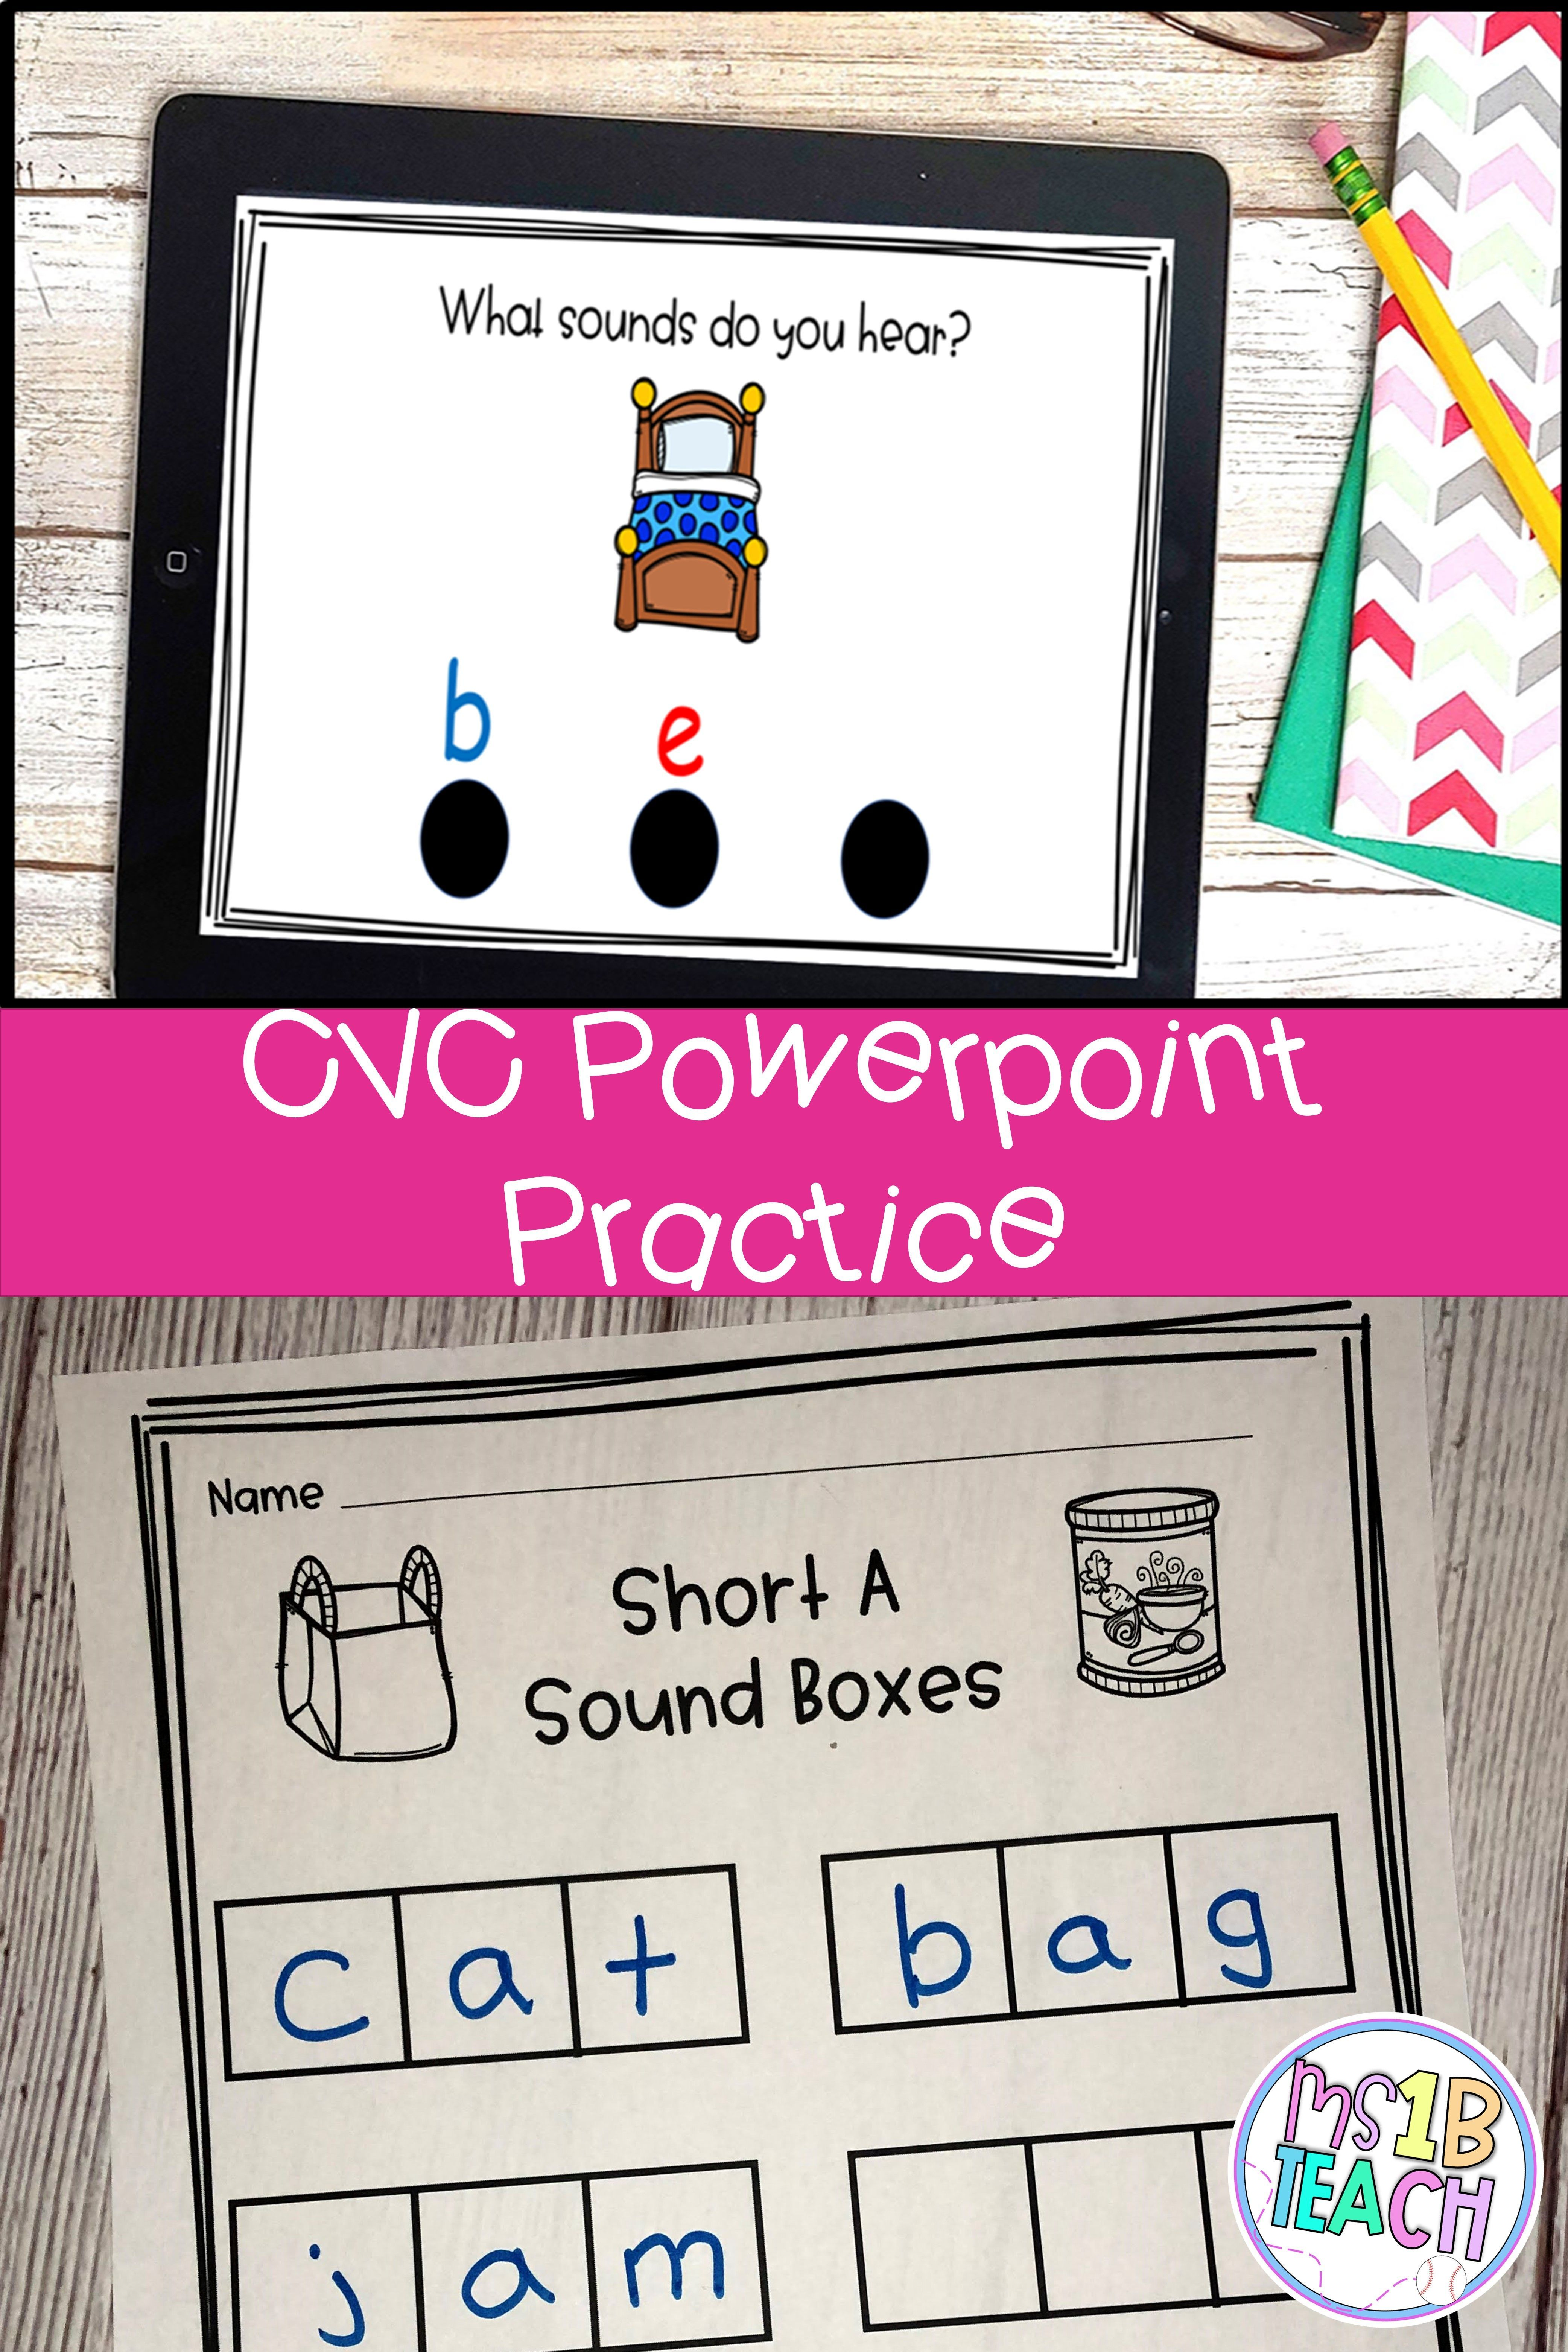 Cvc Practice Activity With Powerpoint Cvc Words Cvc Sound Boxes Activities